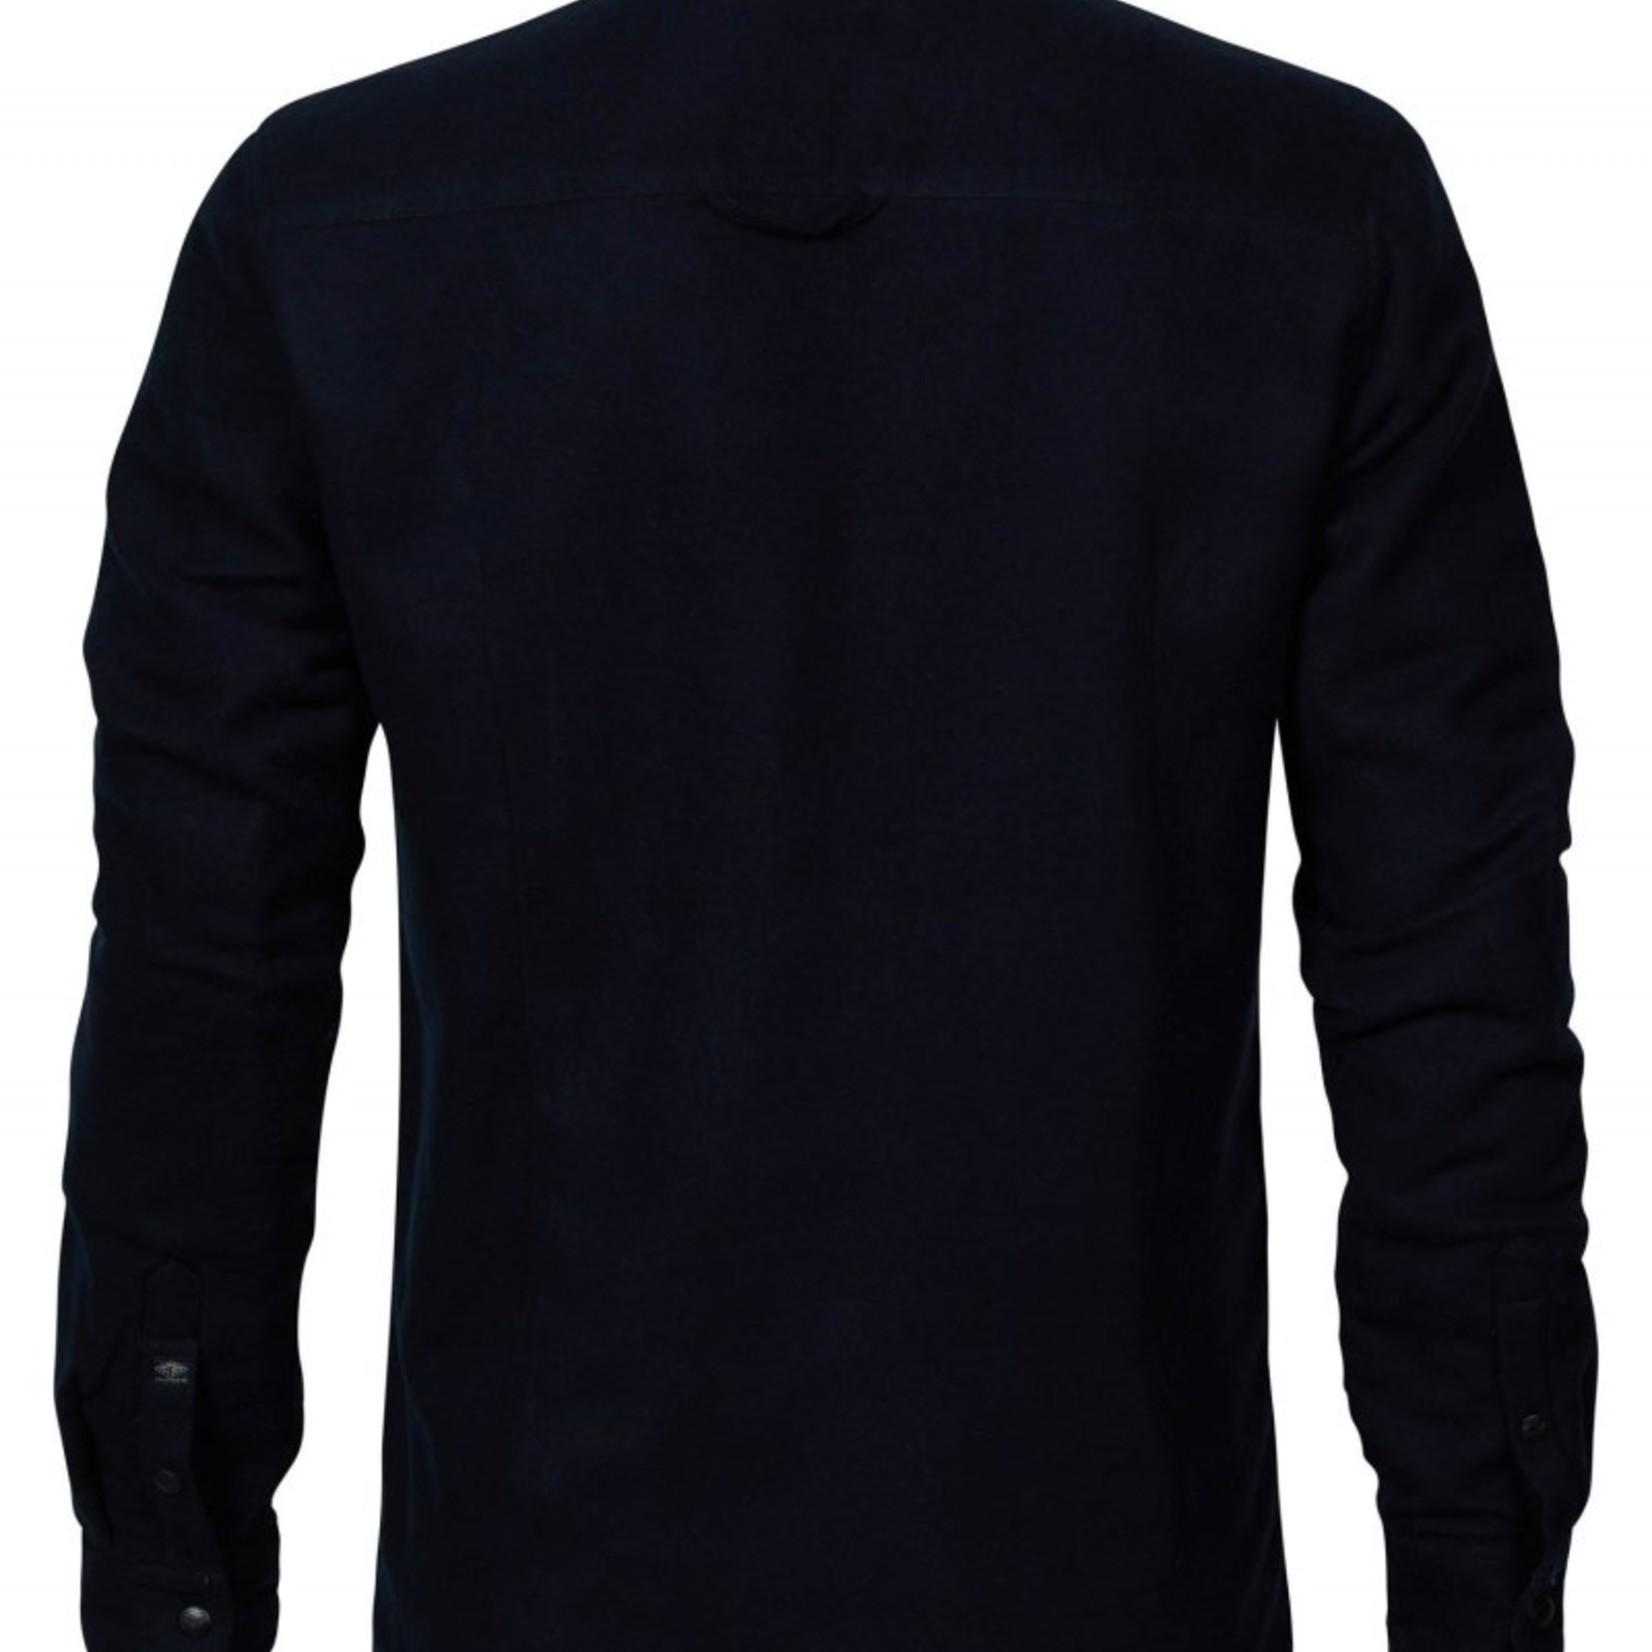 PETROL SHIRT LS, overshirt